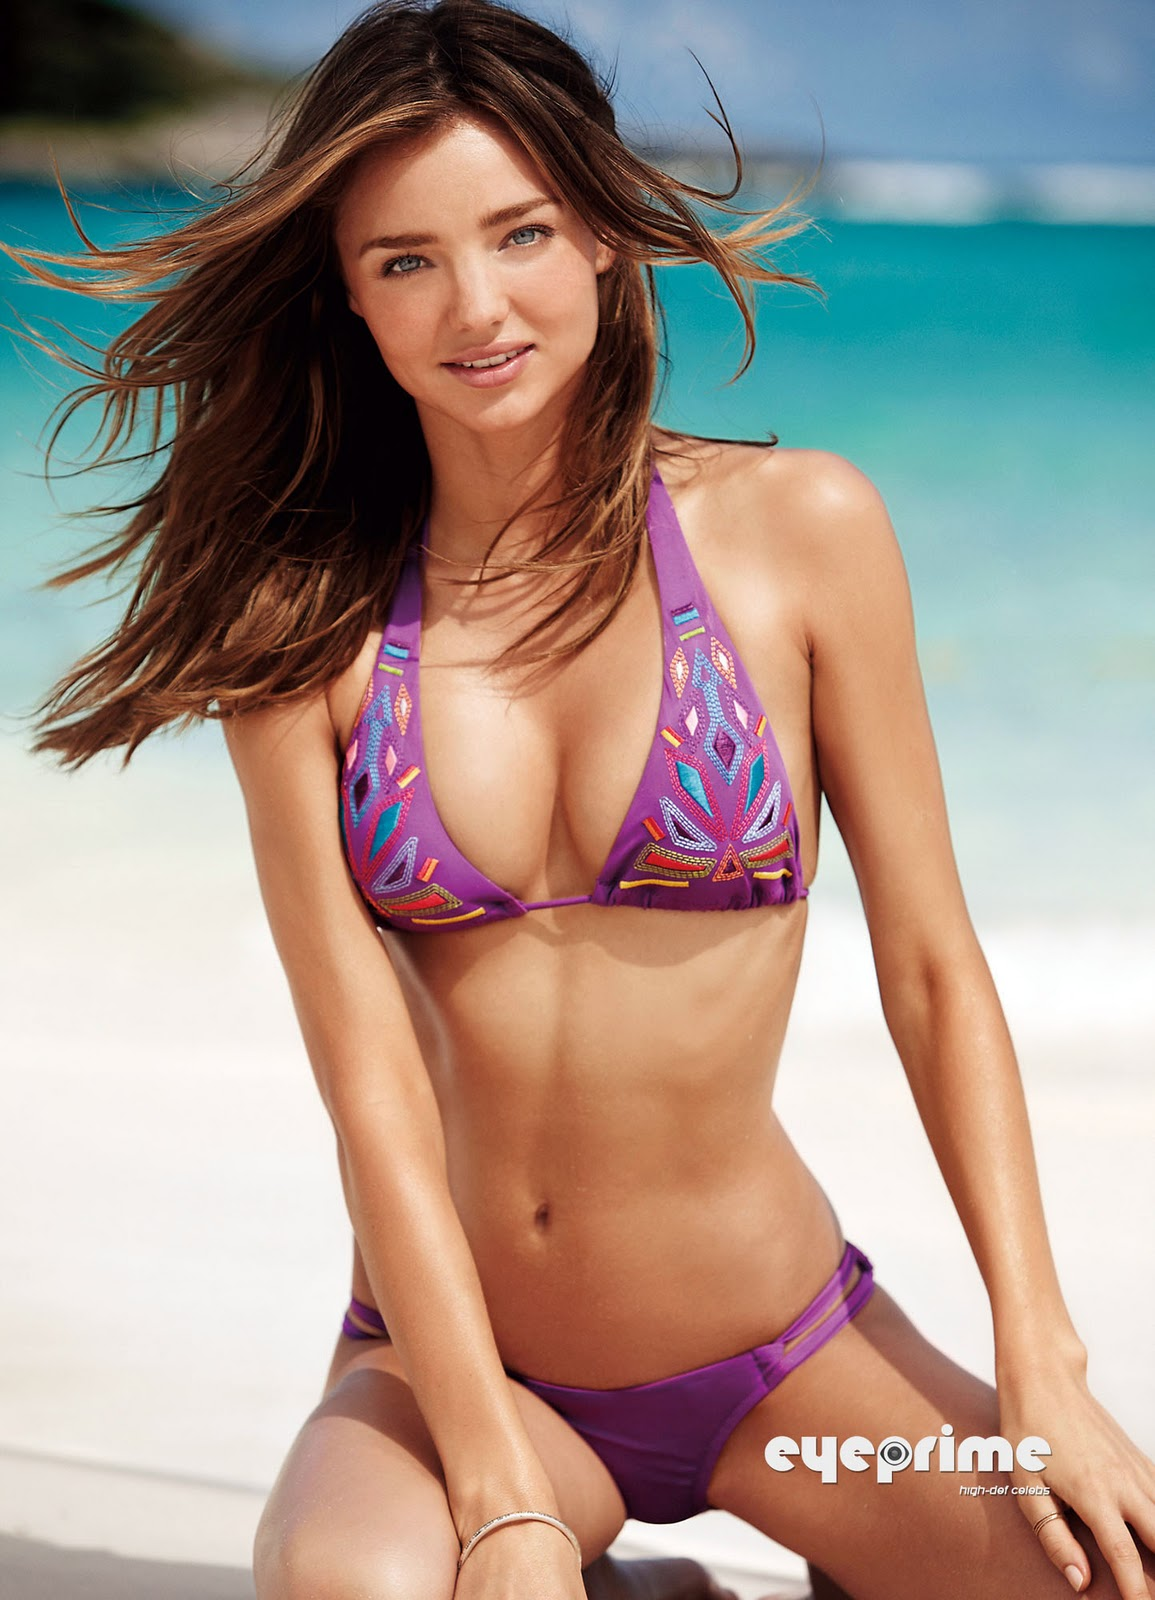 celebrity hot bikini victoria secret models in swimsuit photoshoot